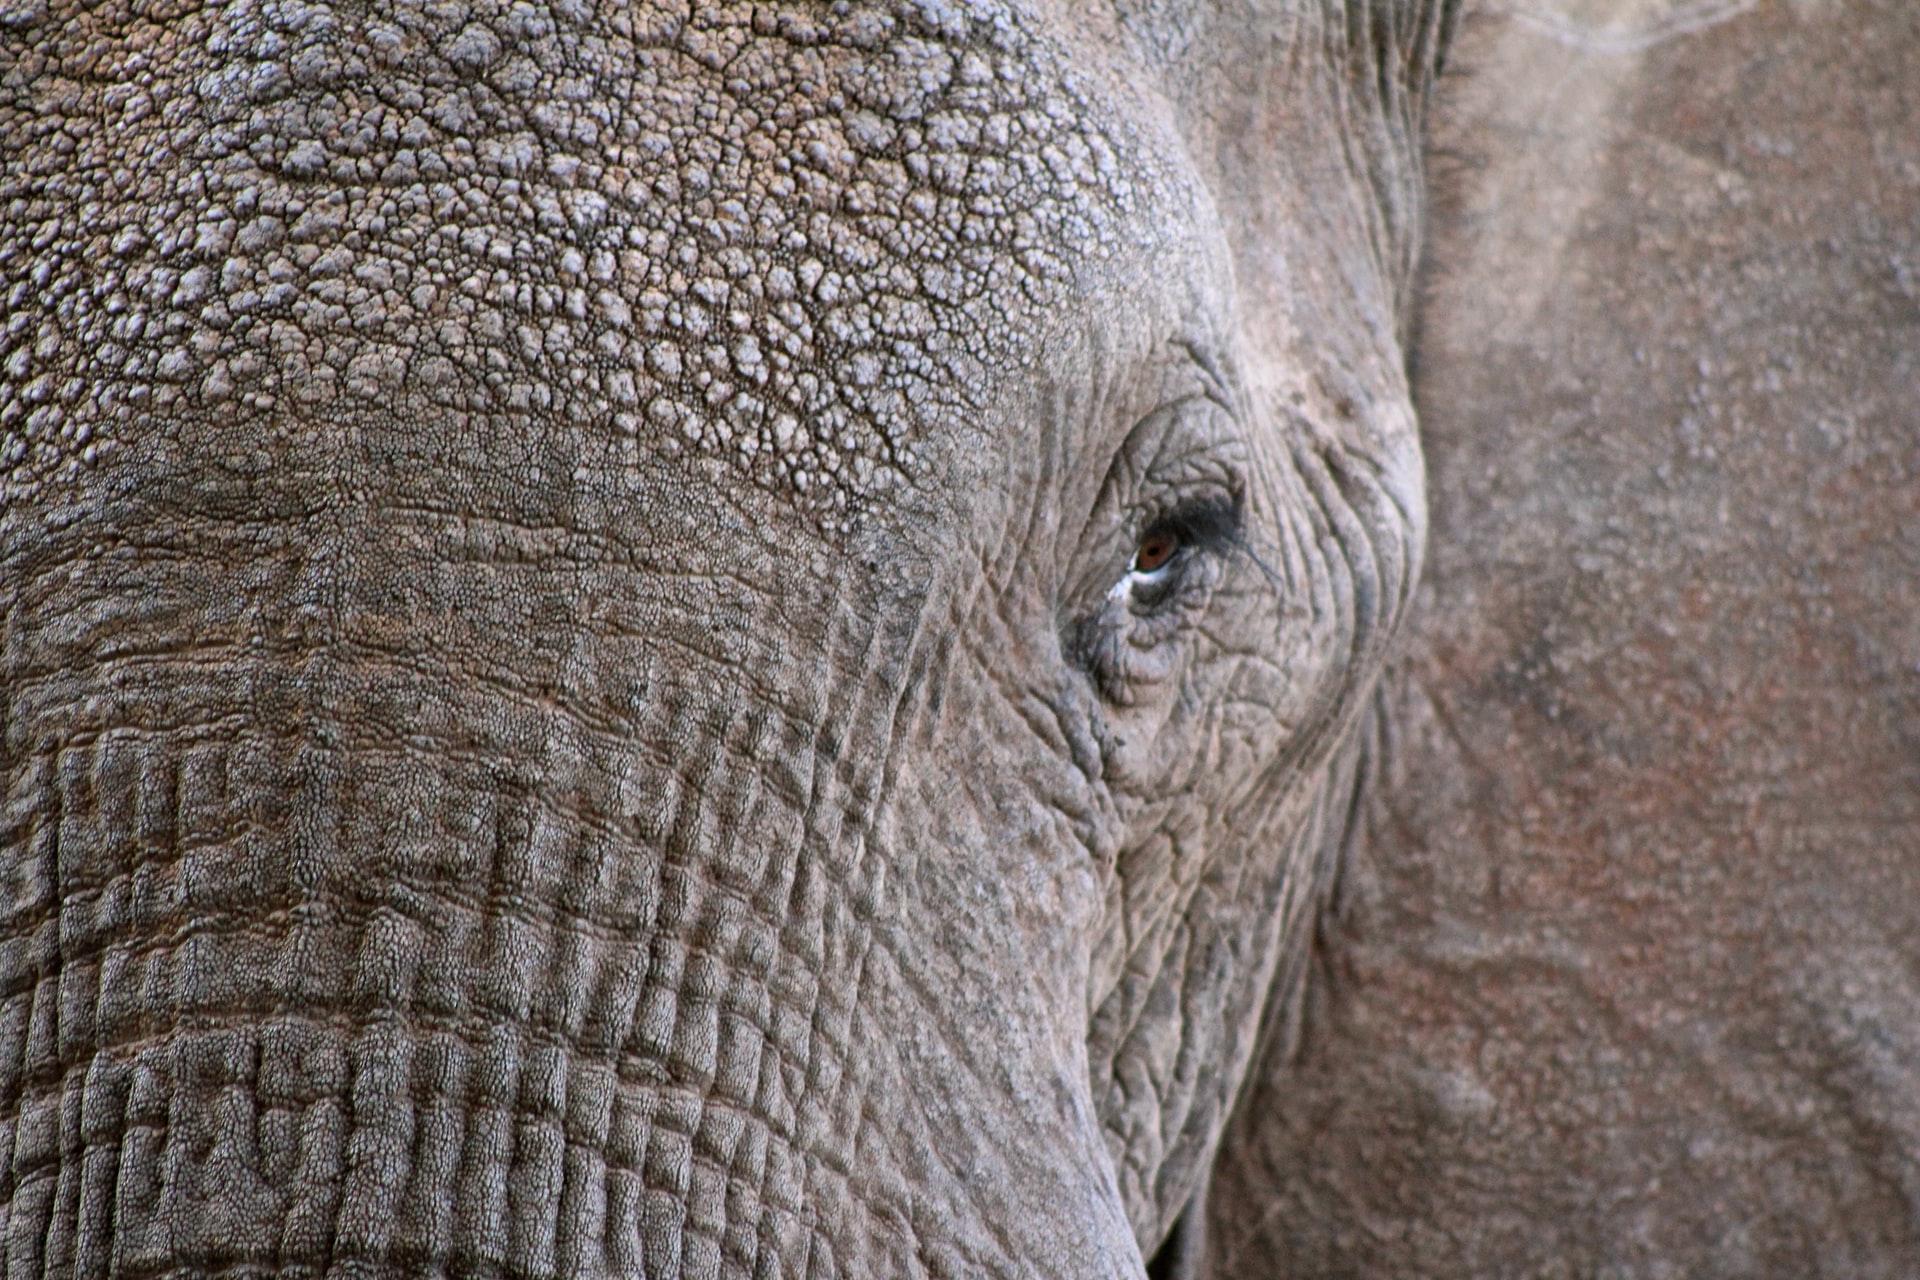 elephants to starve